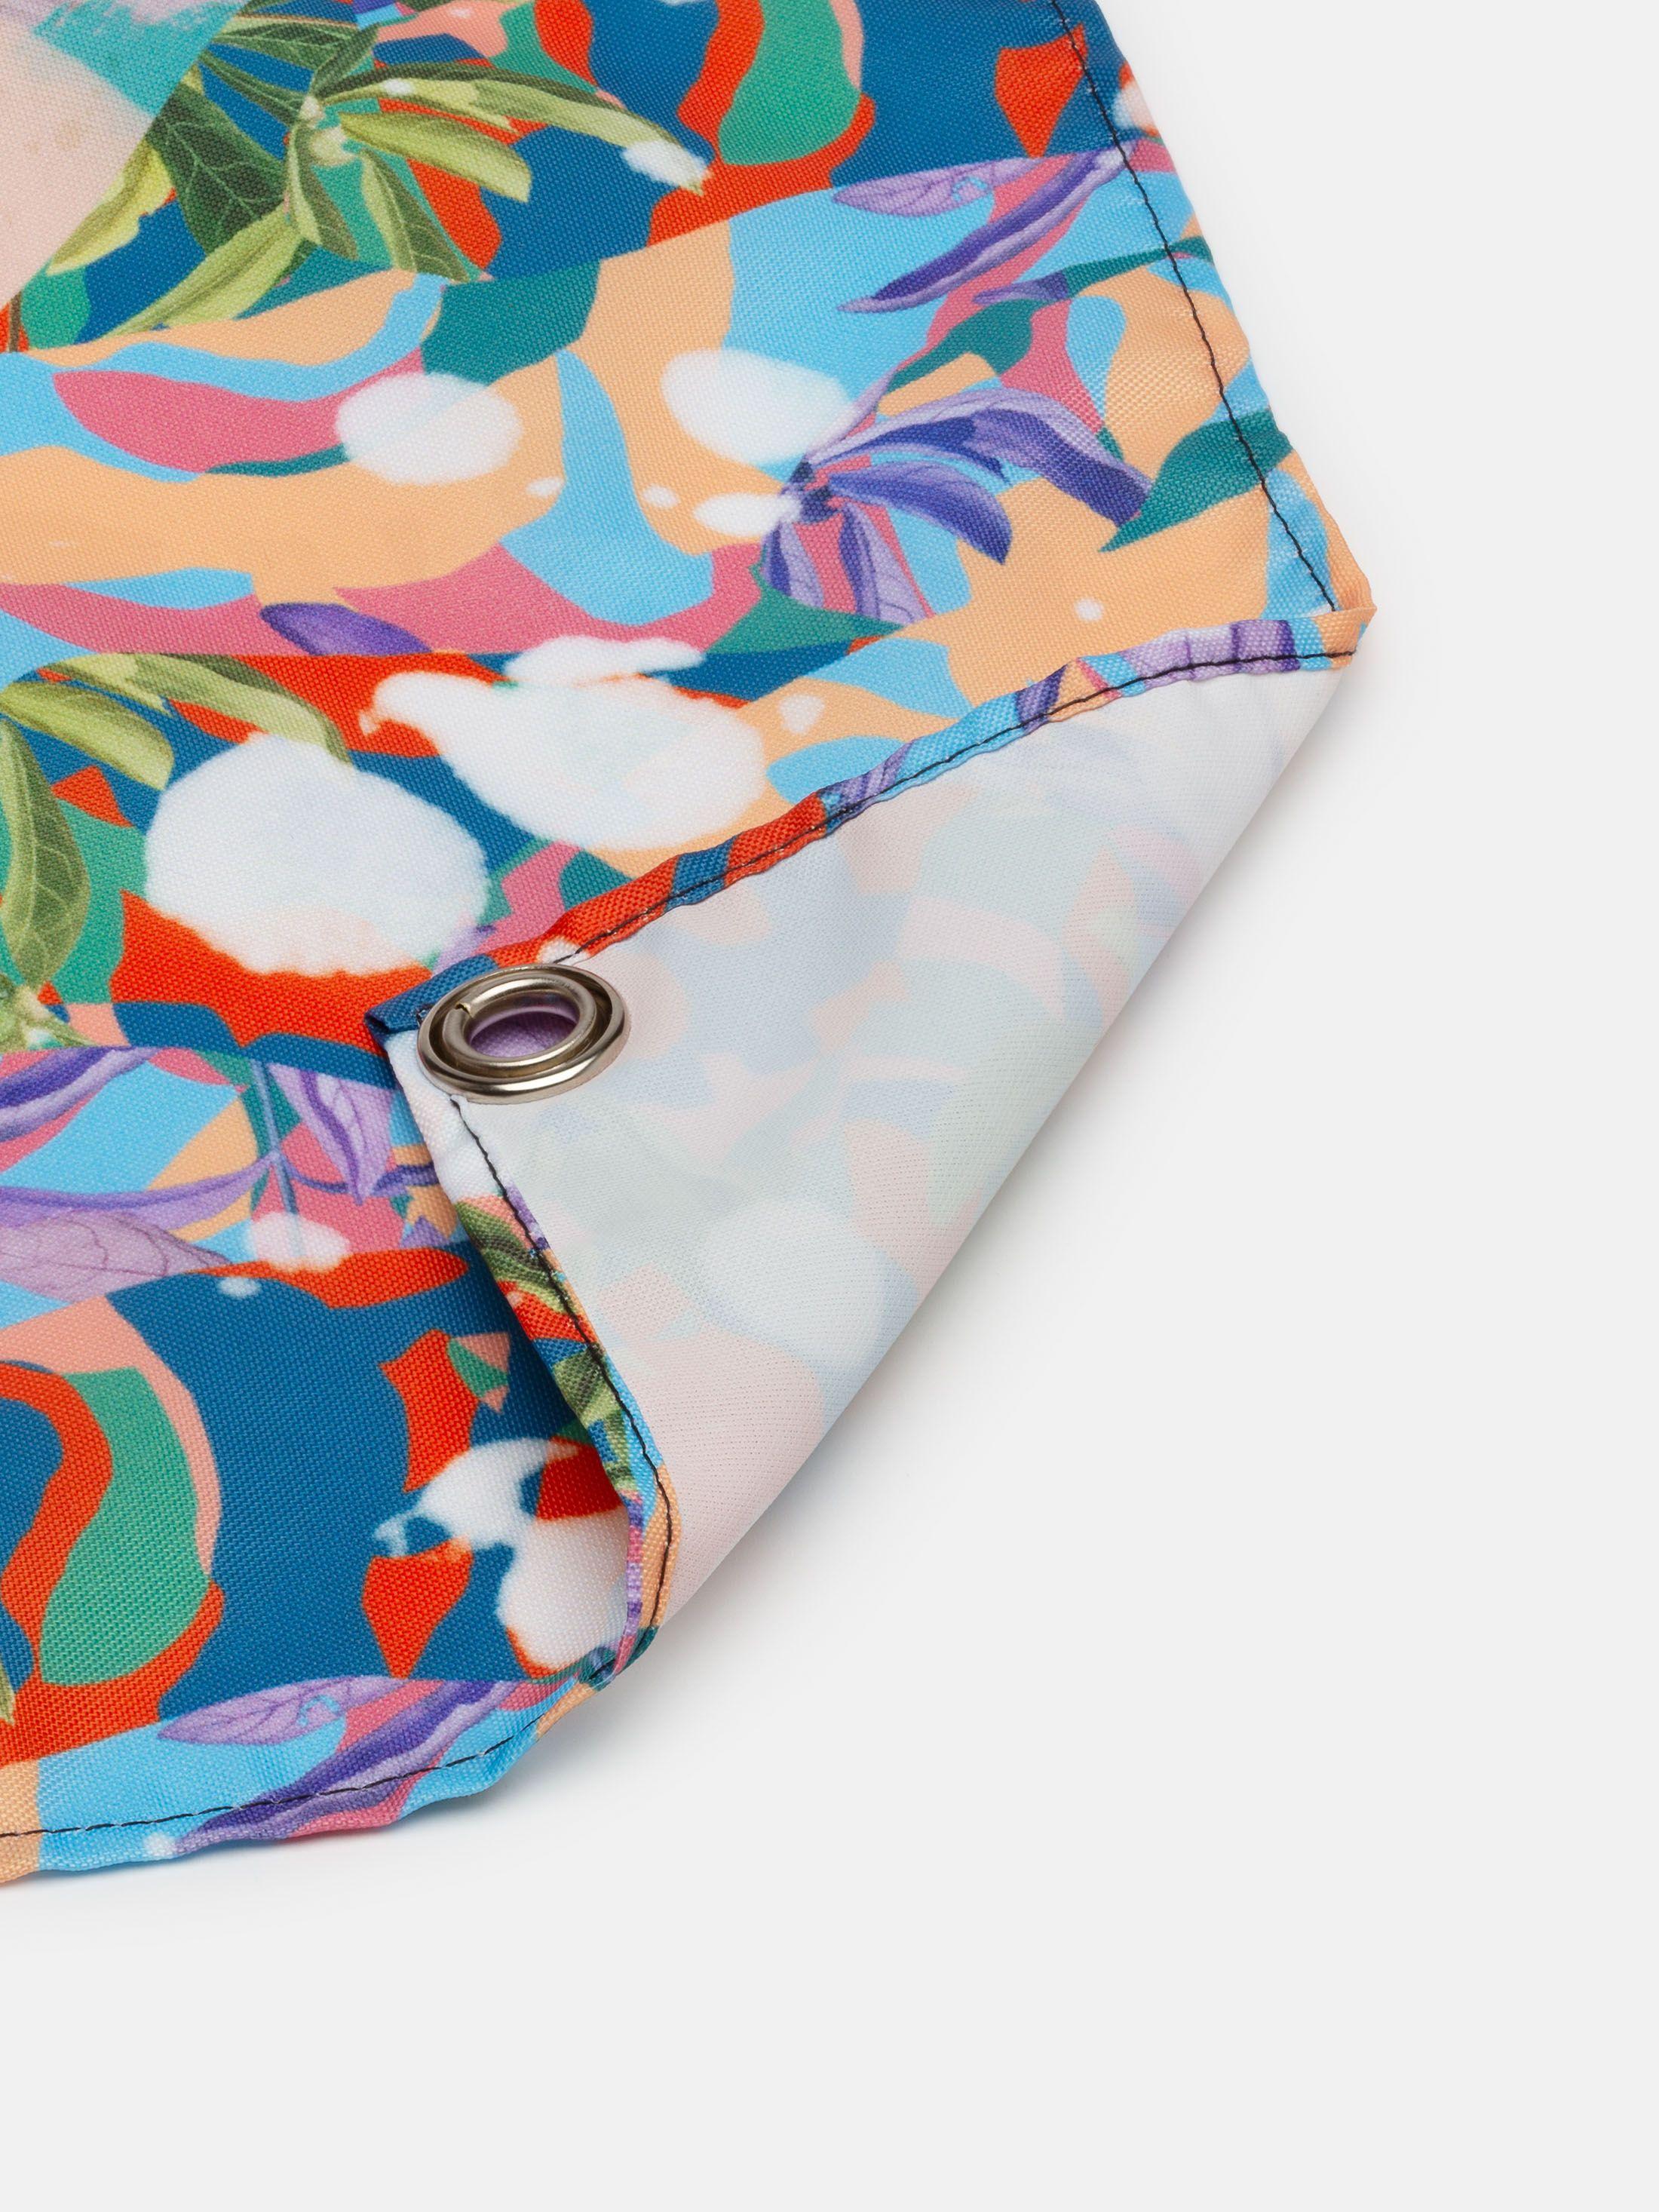 custom fabric banner printing online